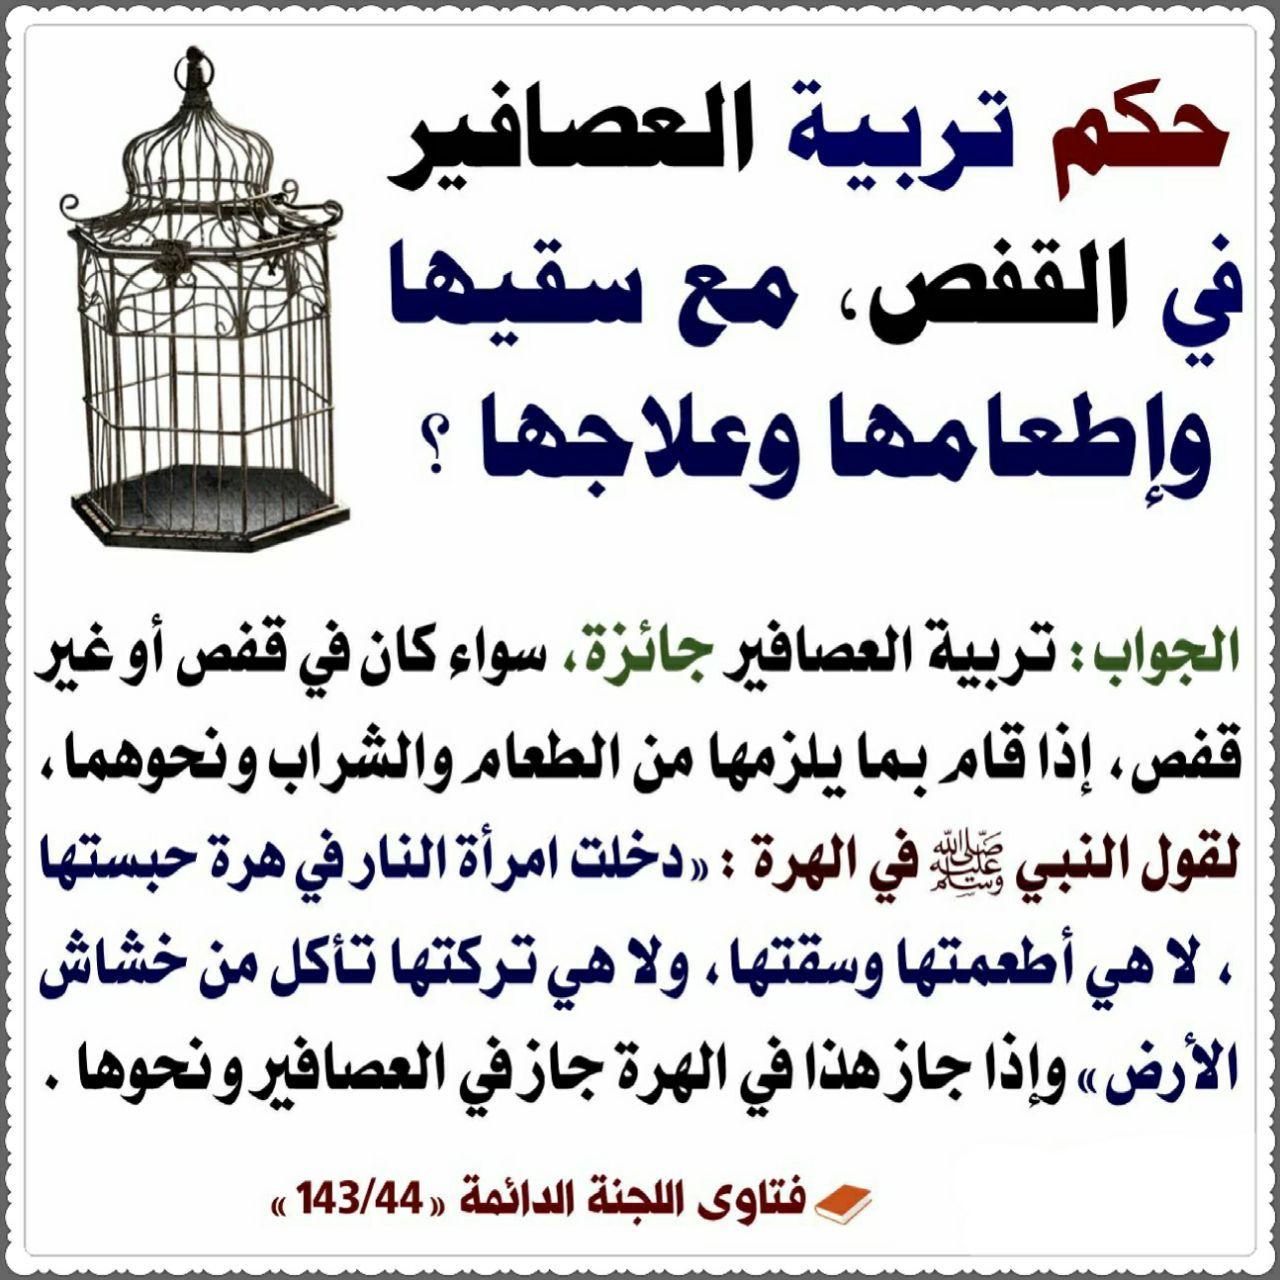 Pin By الأثر الجميل On فتاوى Islamic Teachings Fake Girls Islam